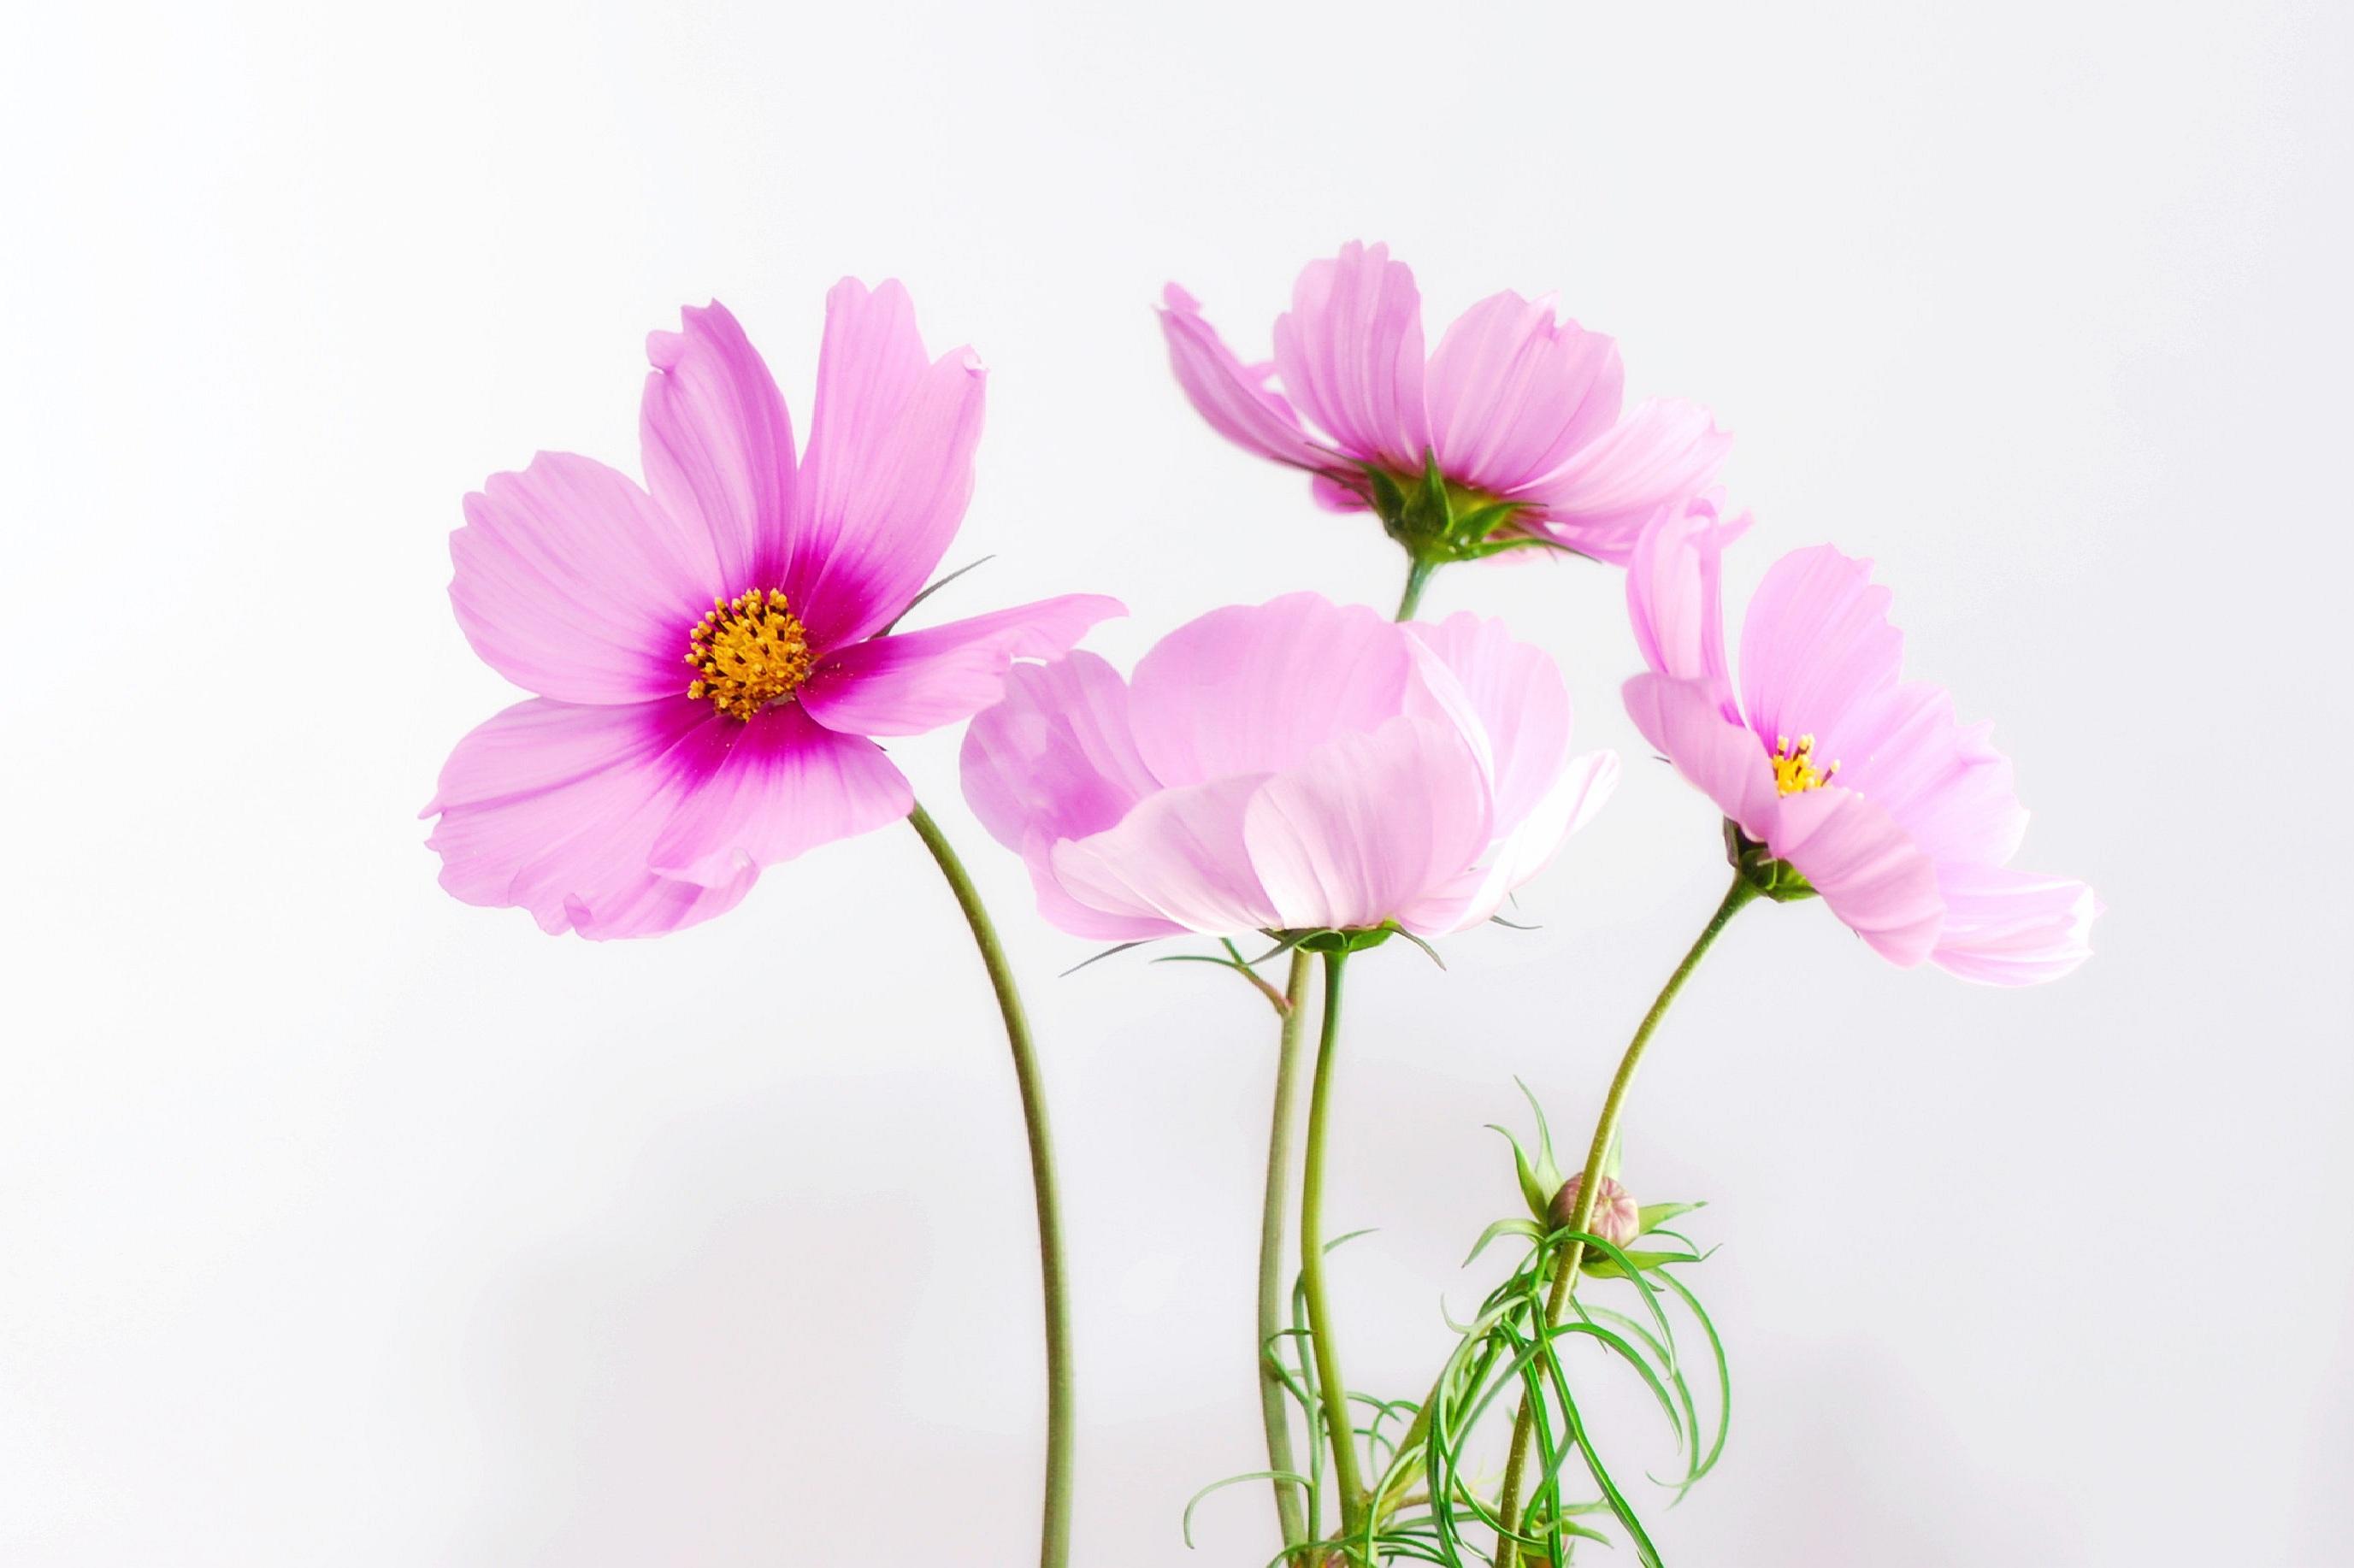 Free Images Nature Blossom Petal Bloom Pollen Spring Pink